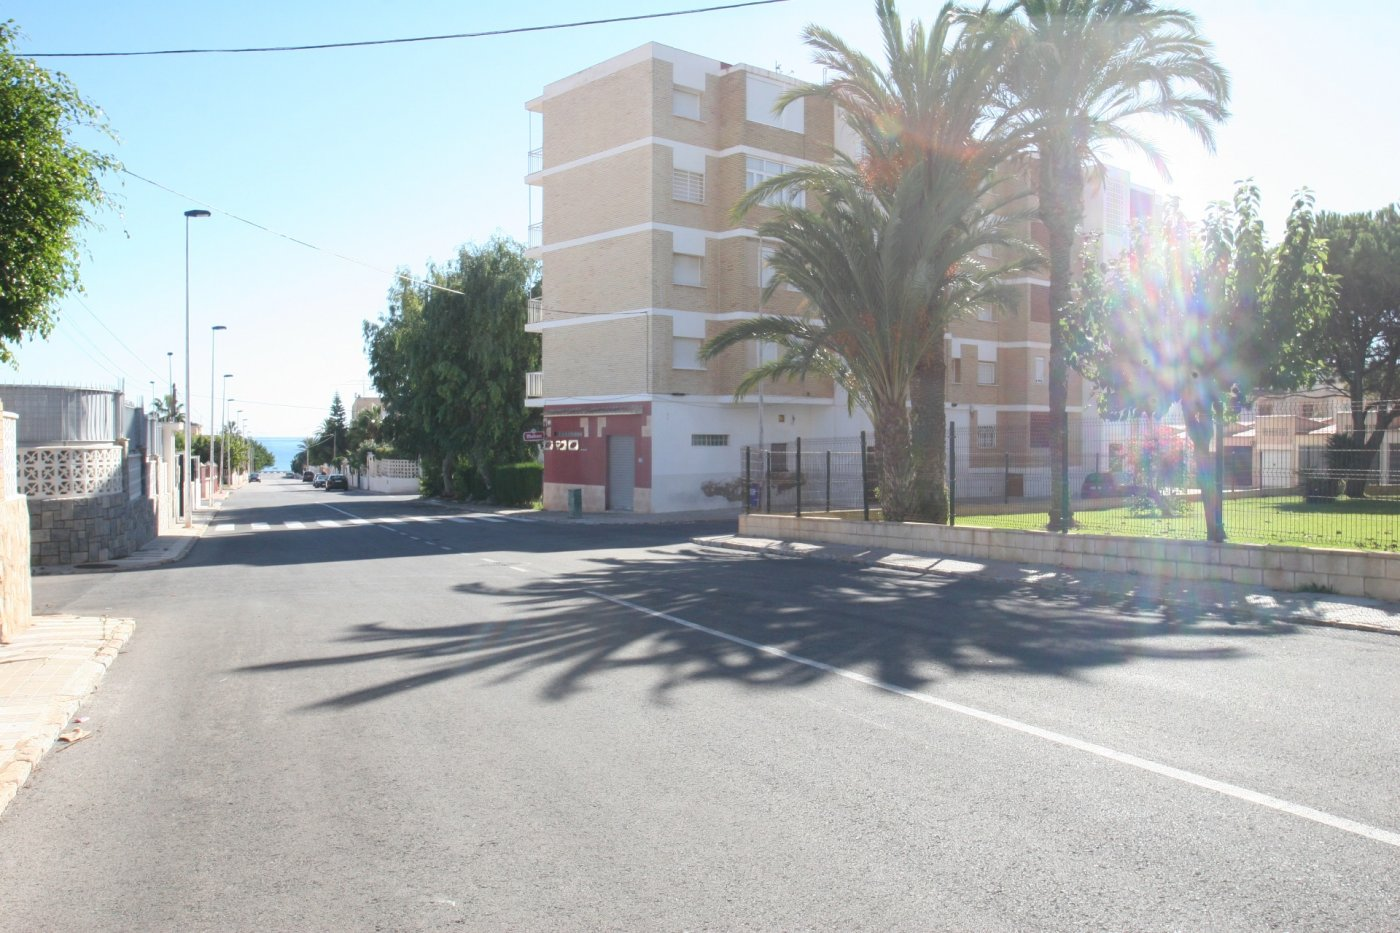 PISO DE 3 DORMITORIOS +TERRAZA+ PISCINA+ZONA OCIO (TENIS, CLUB SOCIAL), TORREVIEJA